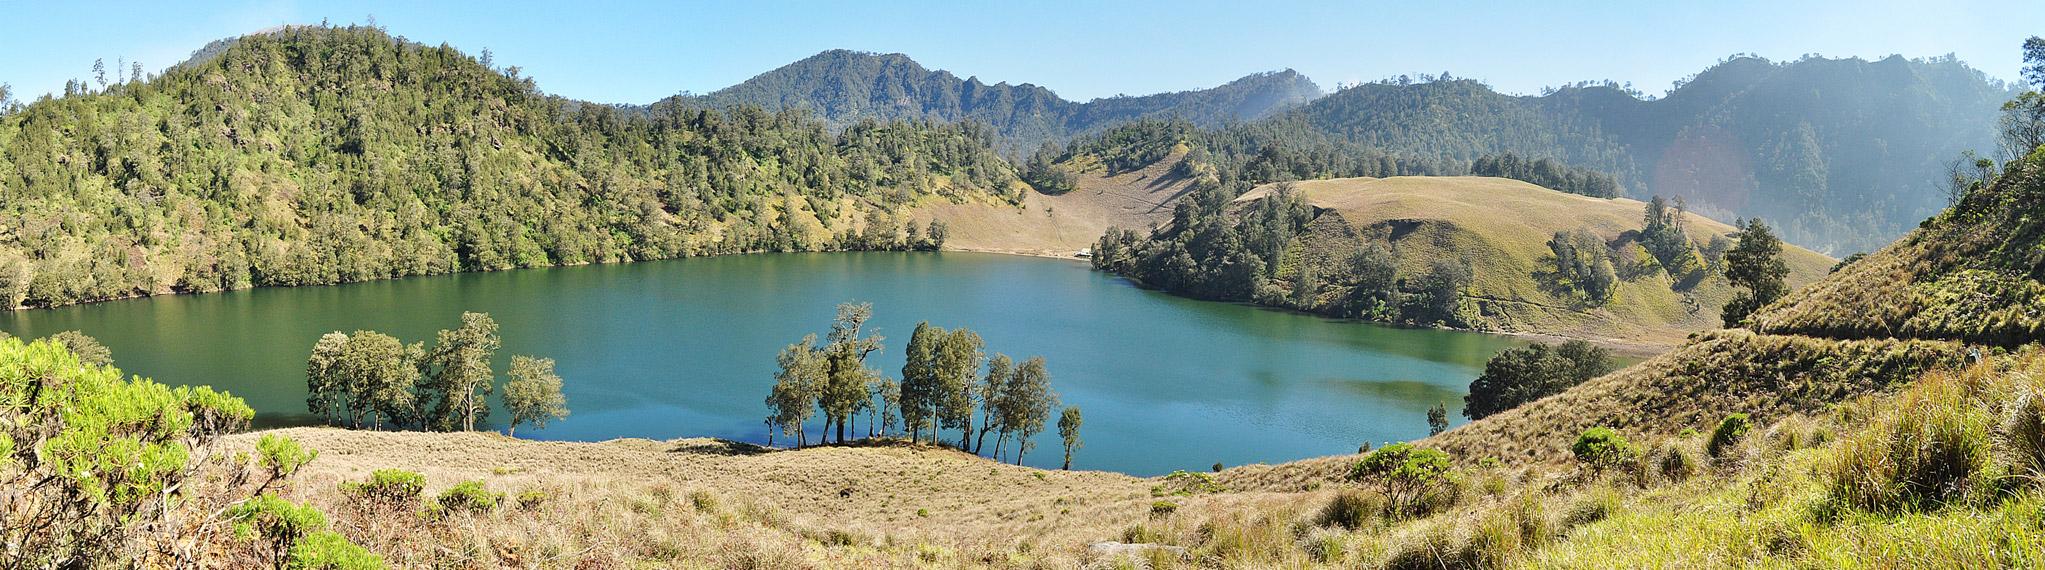 Panorama keindahan Danau Ranu Kumbolo dilihat dari atas